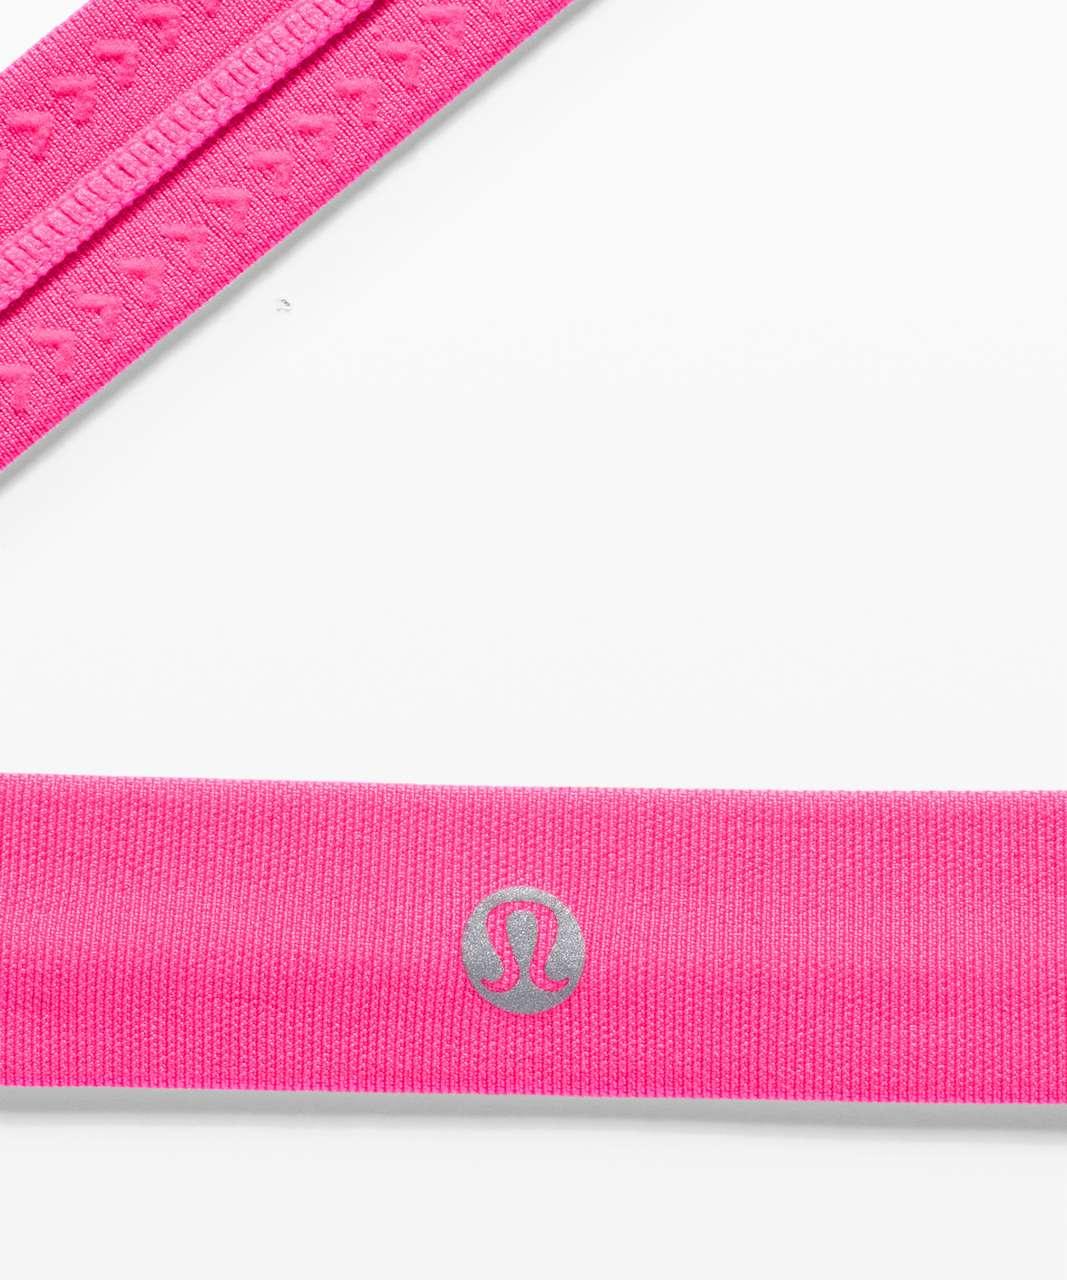 Lululemon Cardio Cross Trainer Headband - Pink Highlight